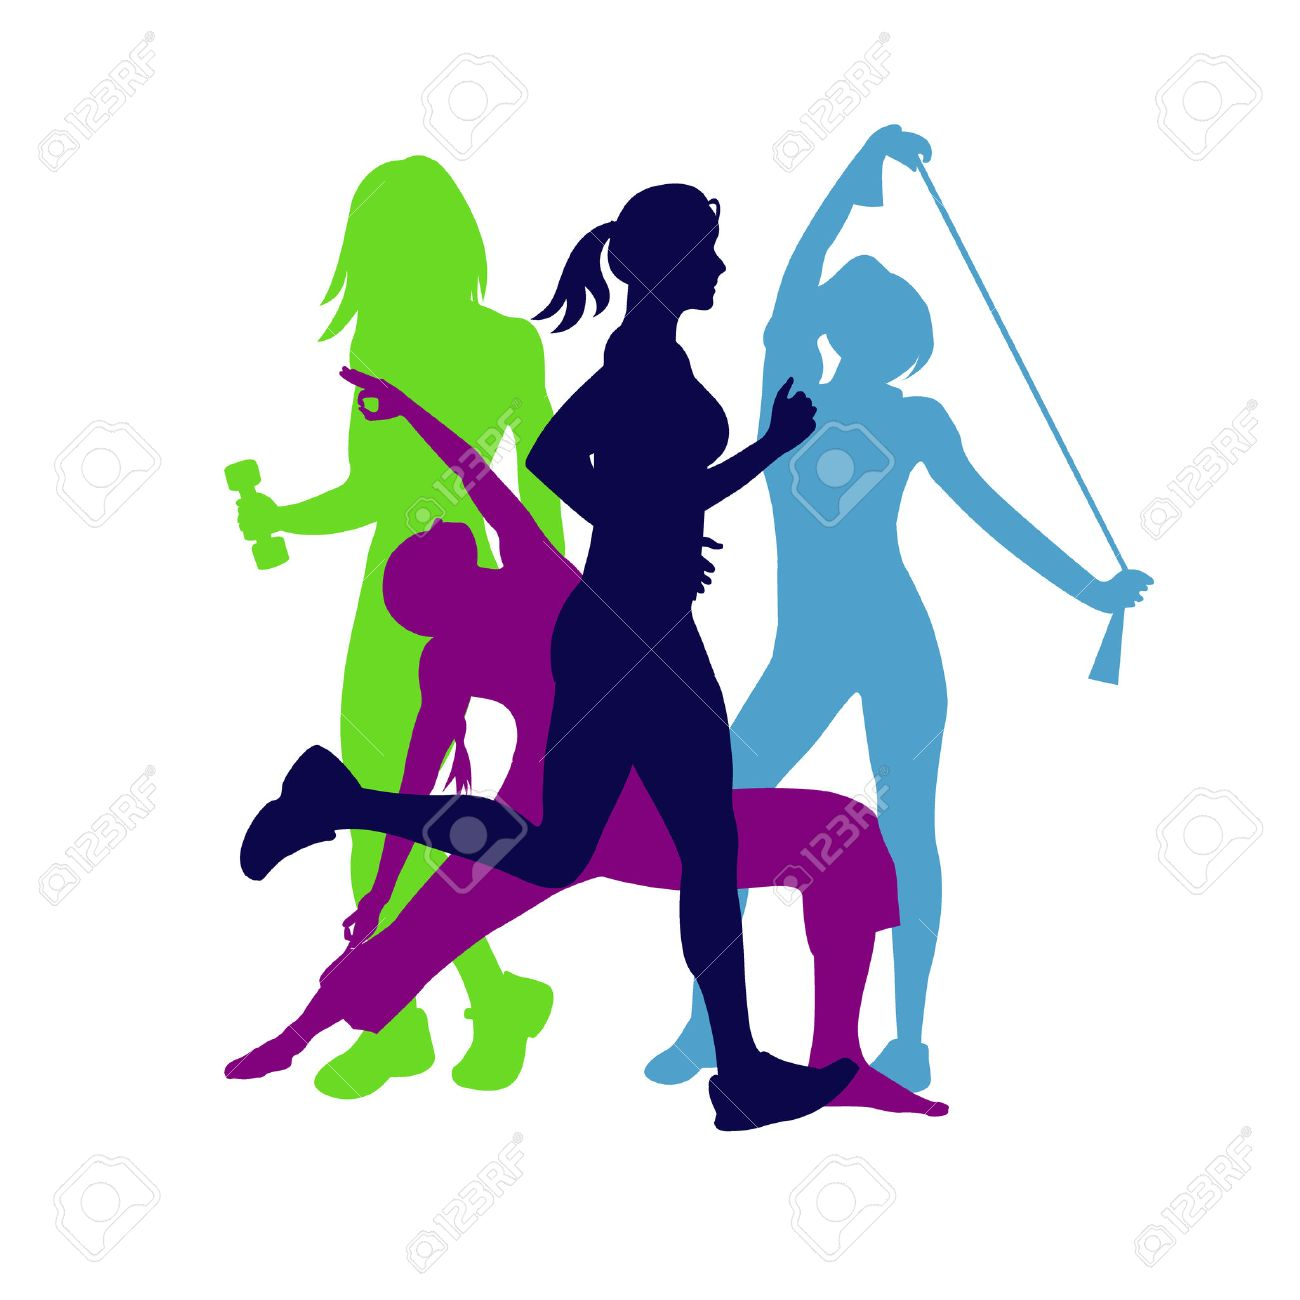 fitness emblem, woman silhouette, illustration - 53862974